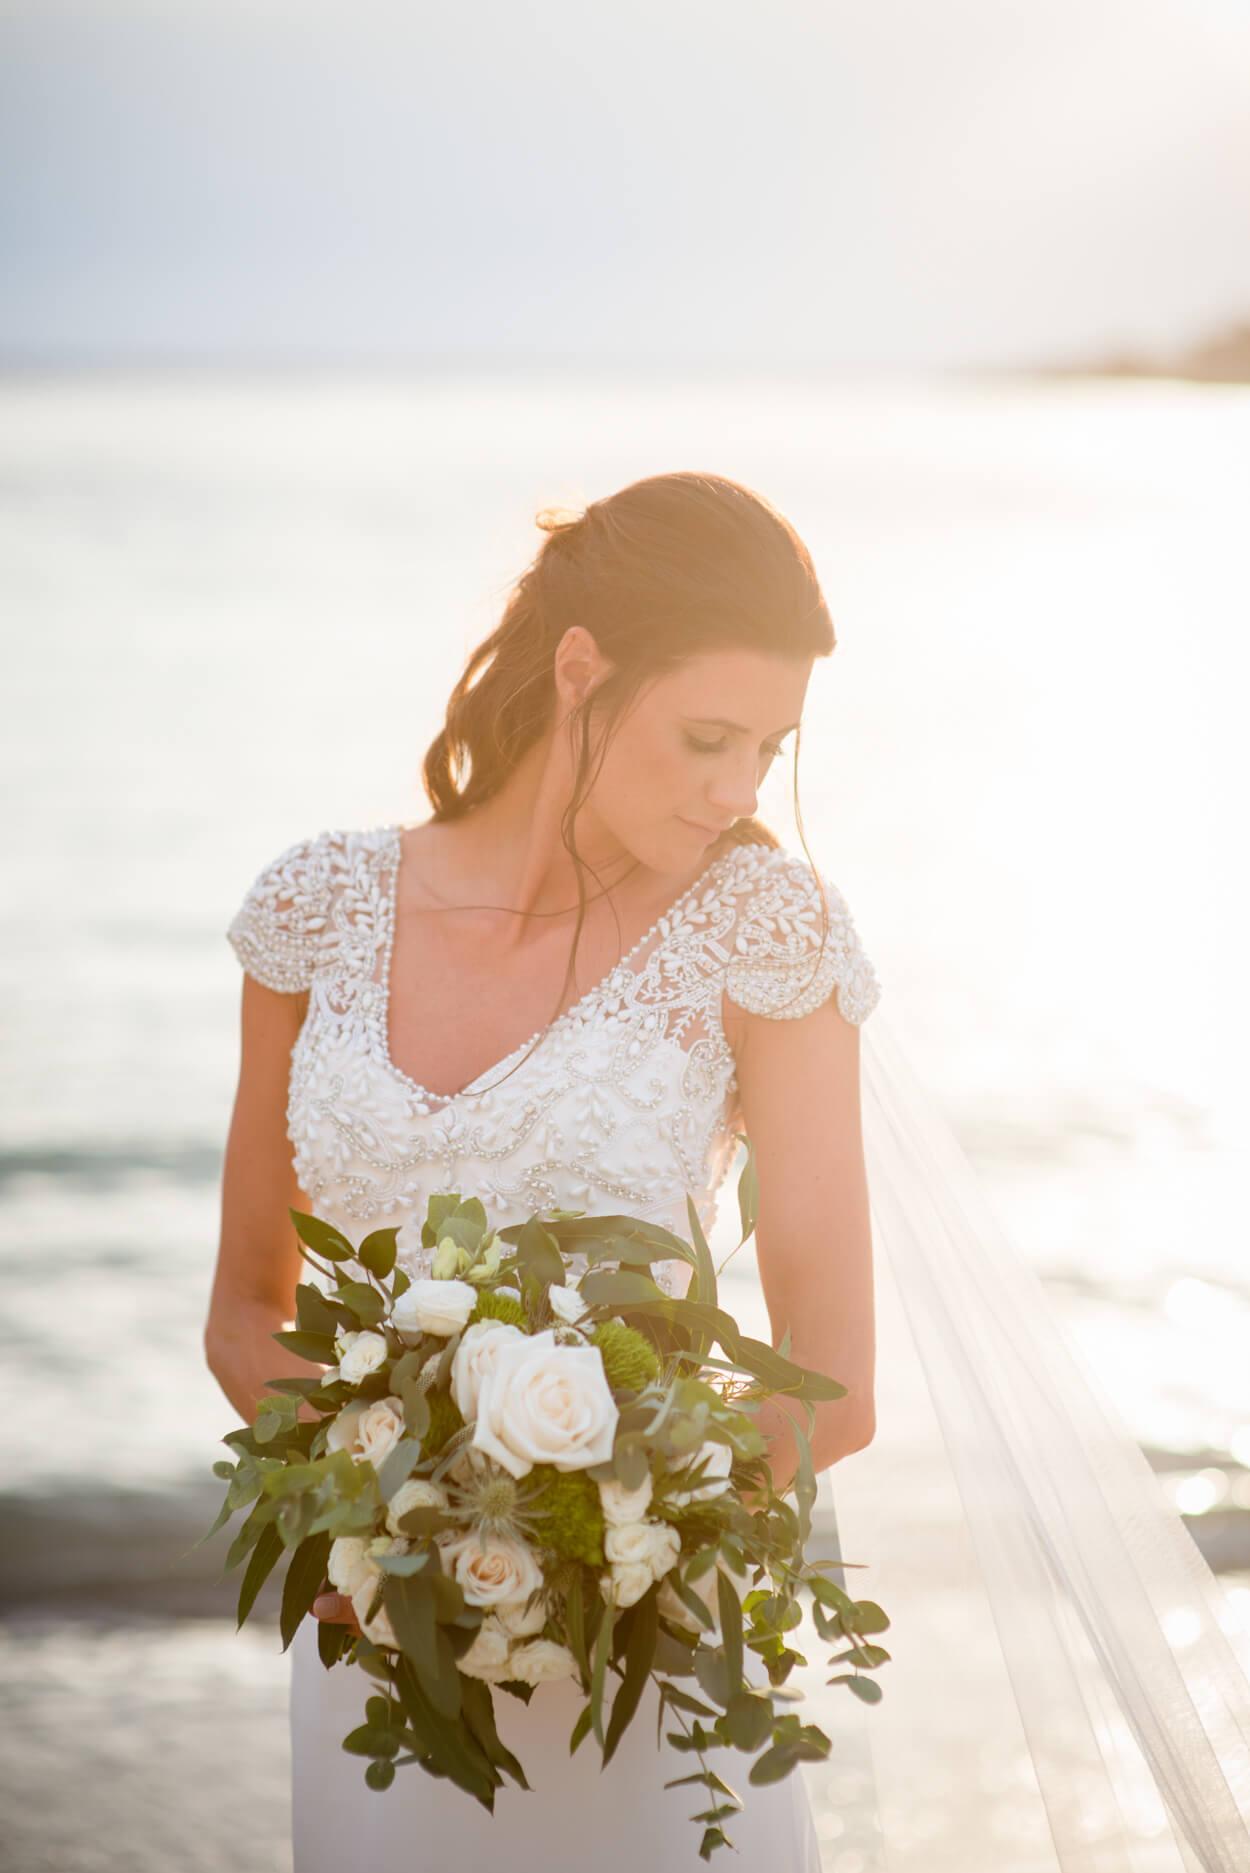 bride portrait sunset beach sea view venue wedding white roses flowers